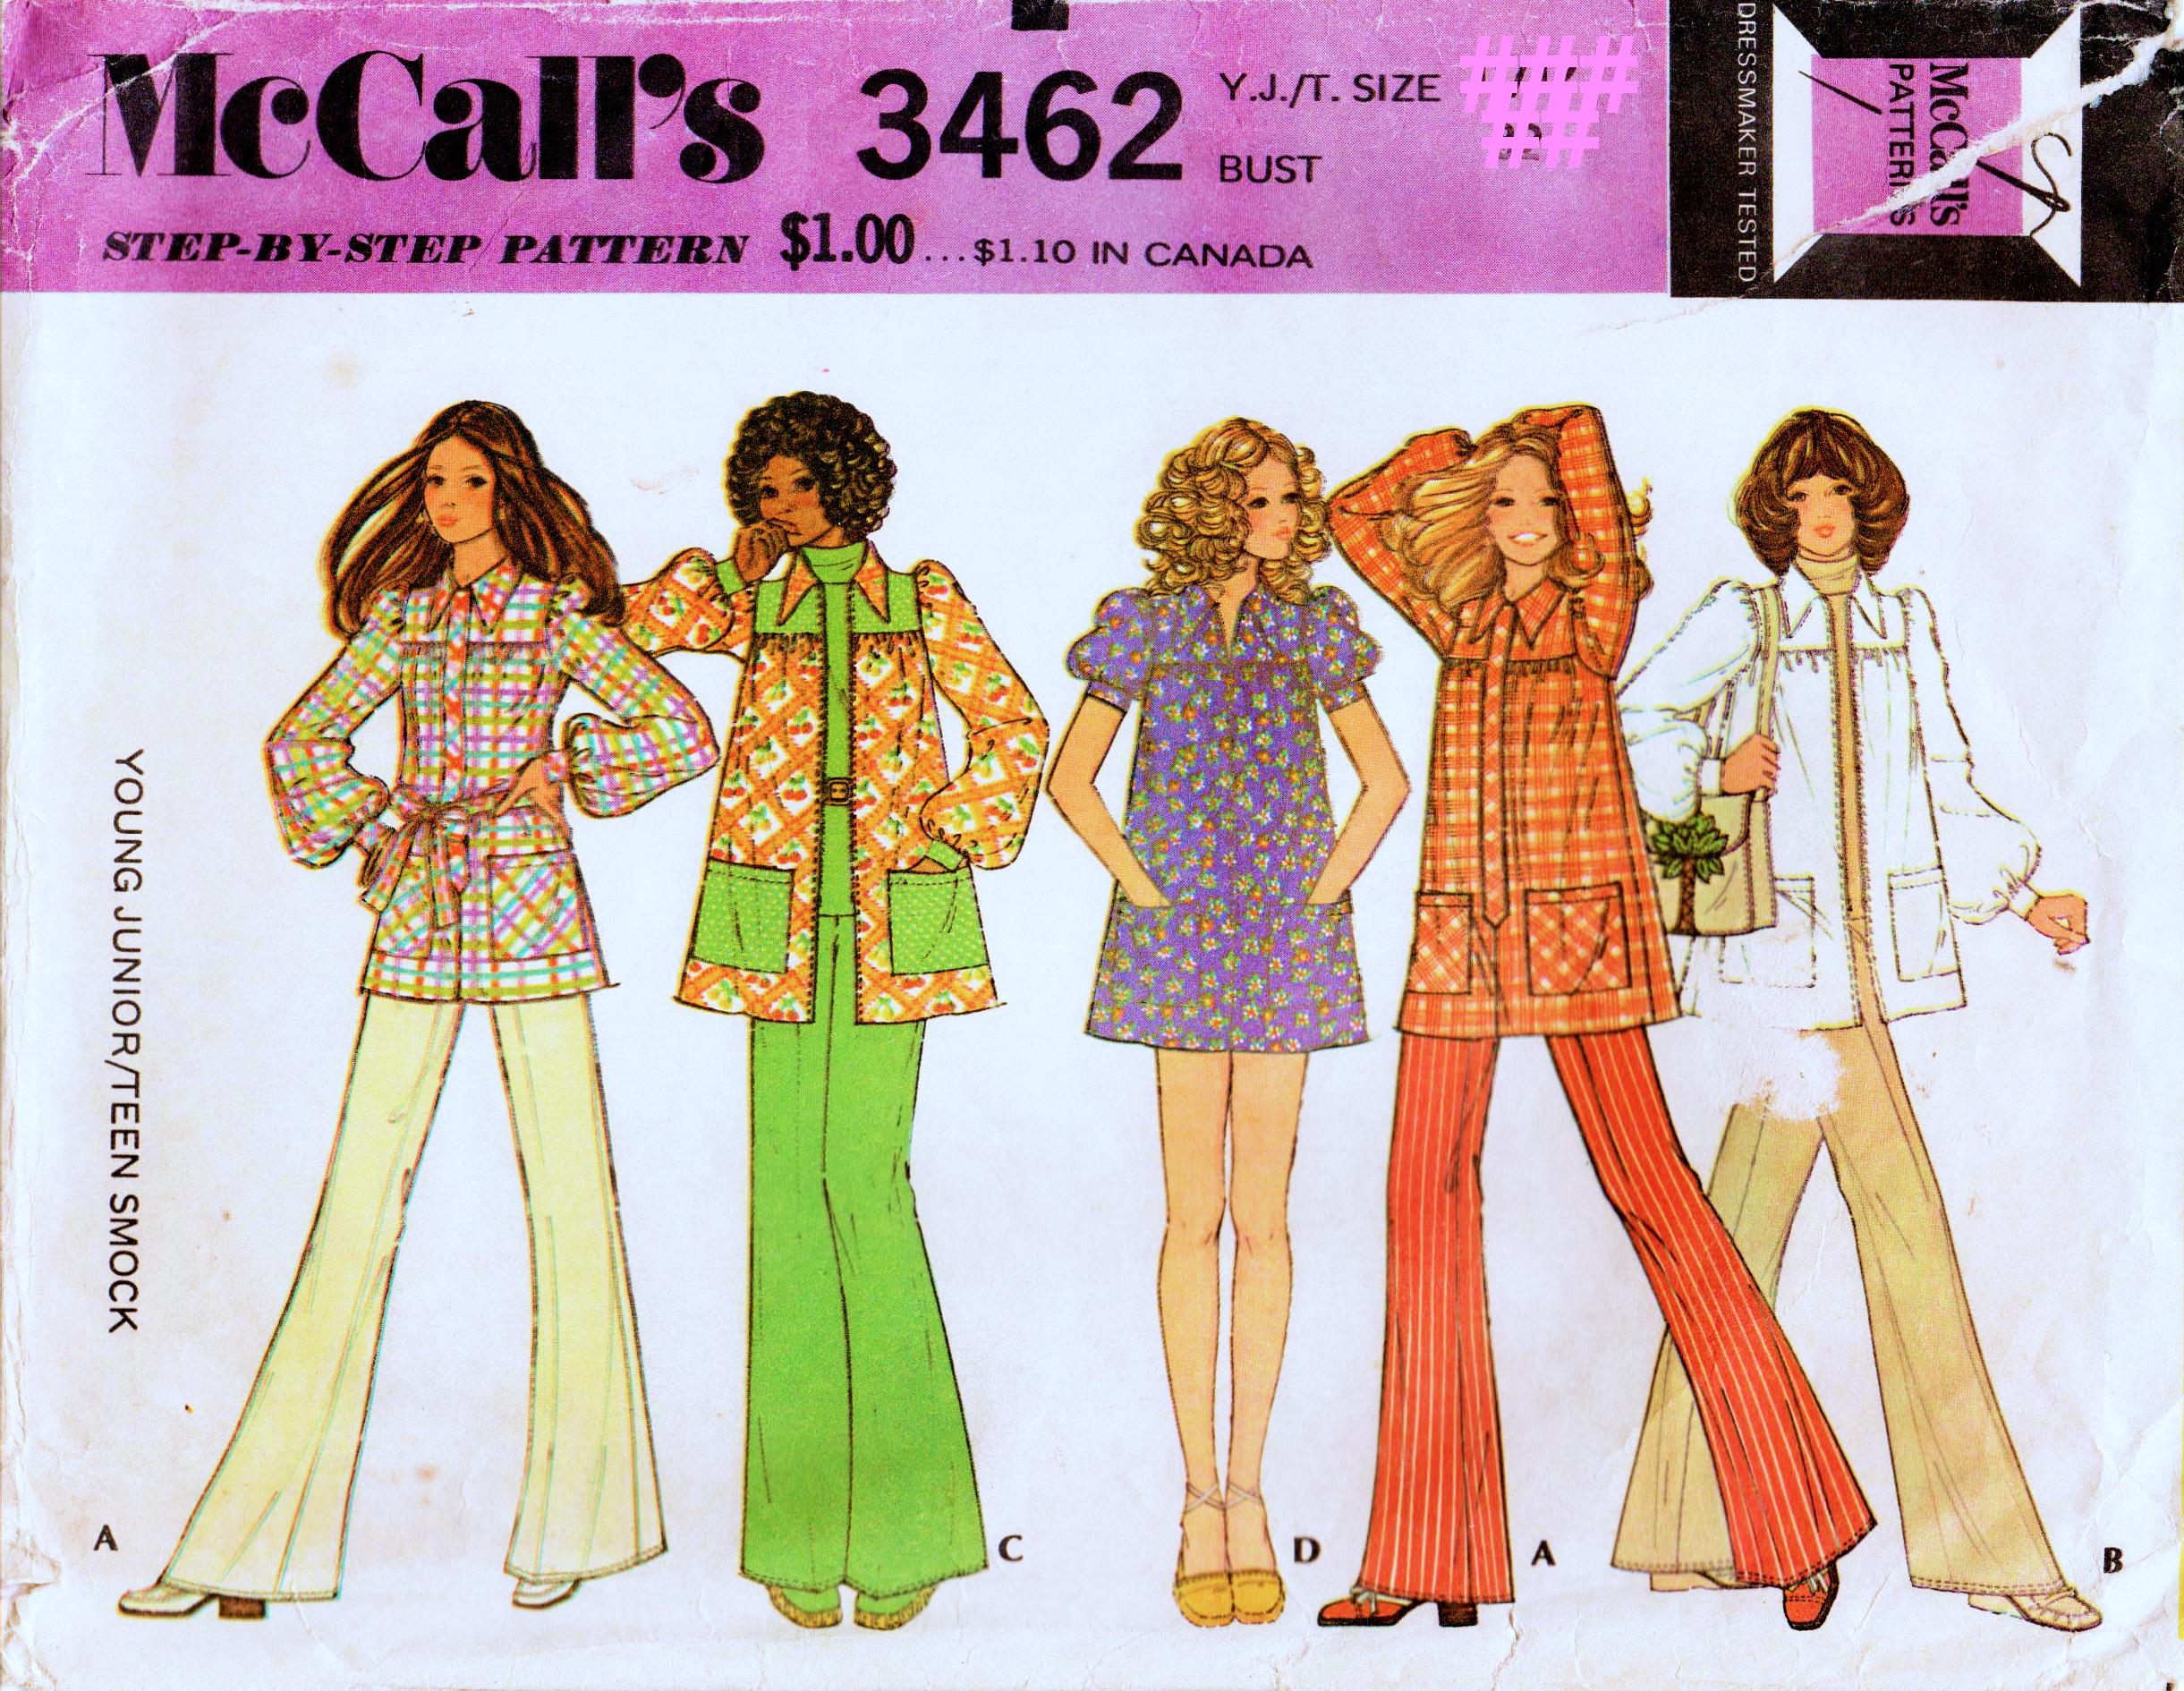 McCall's 3462 A